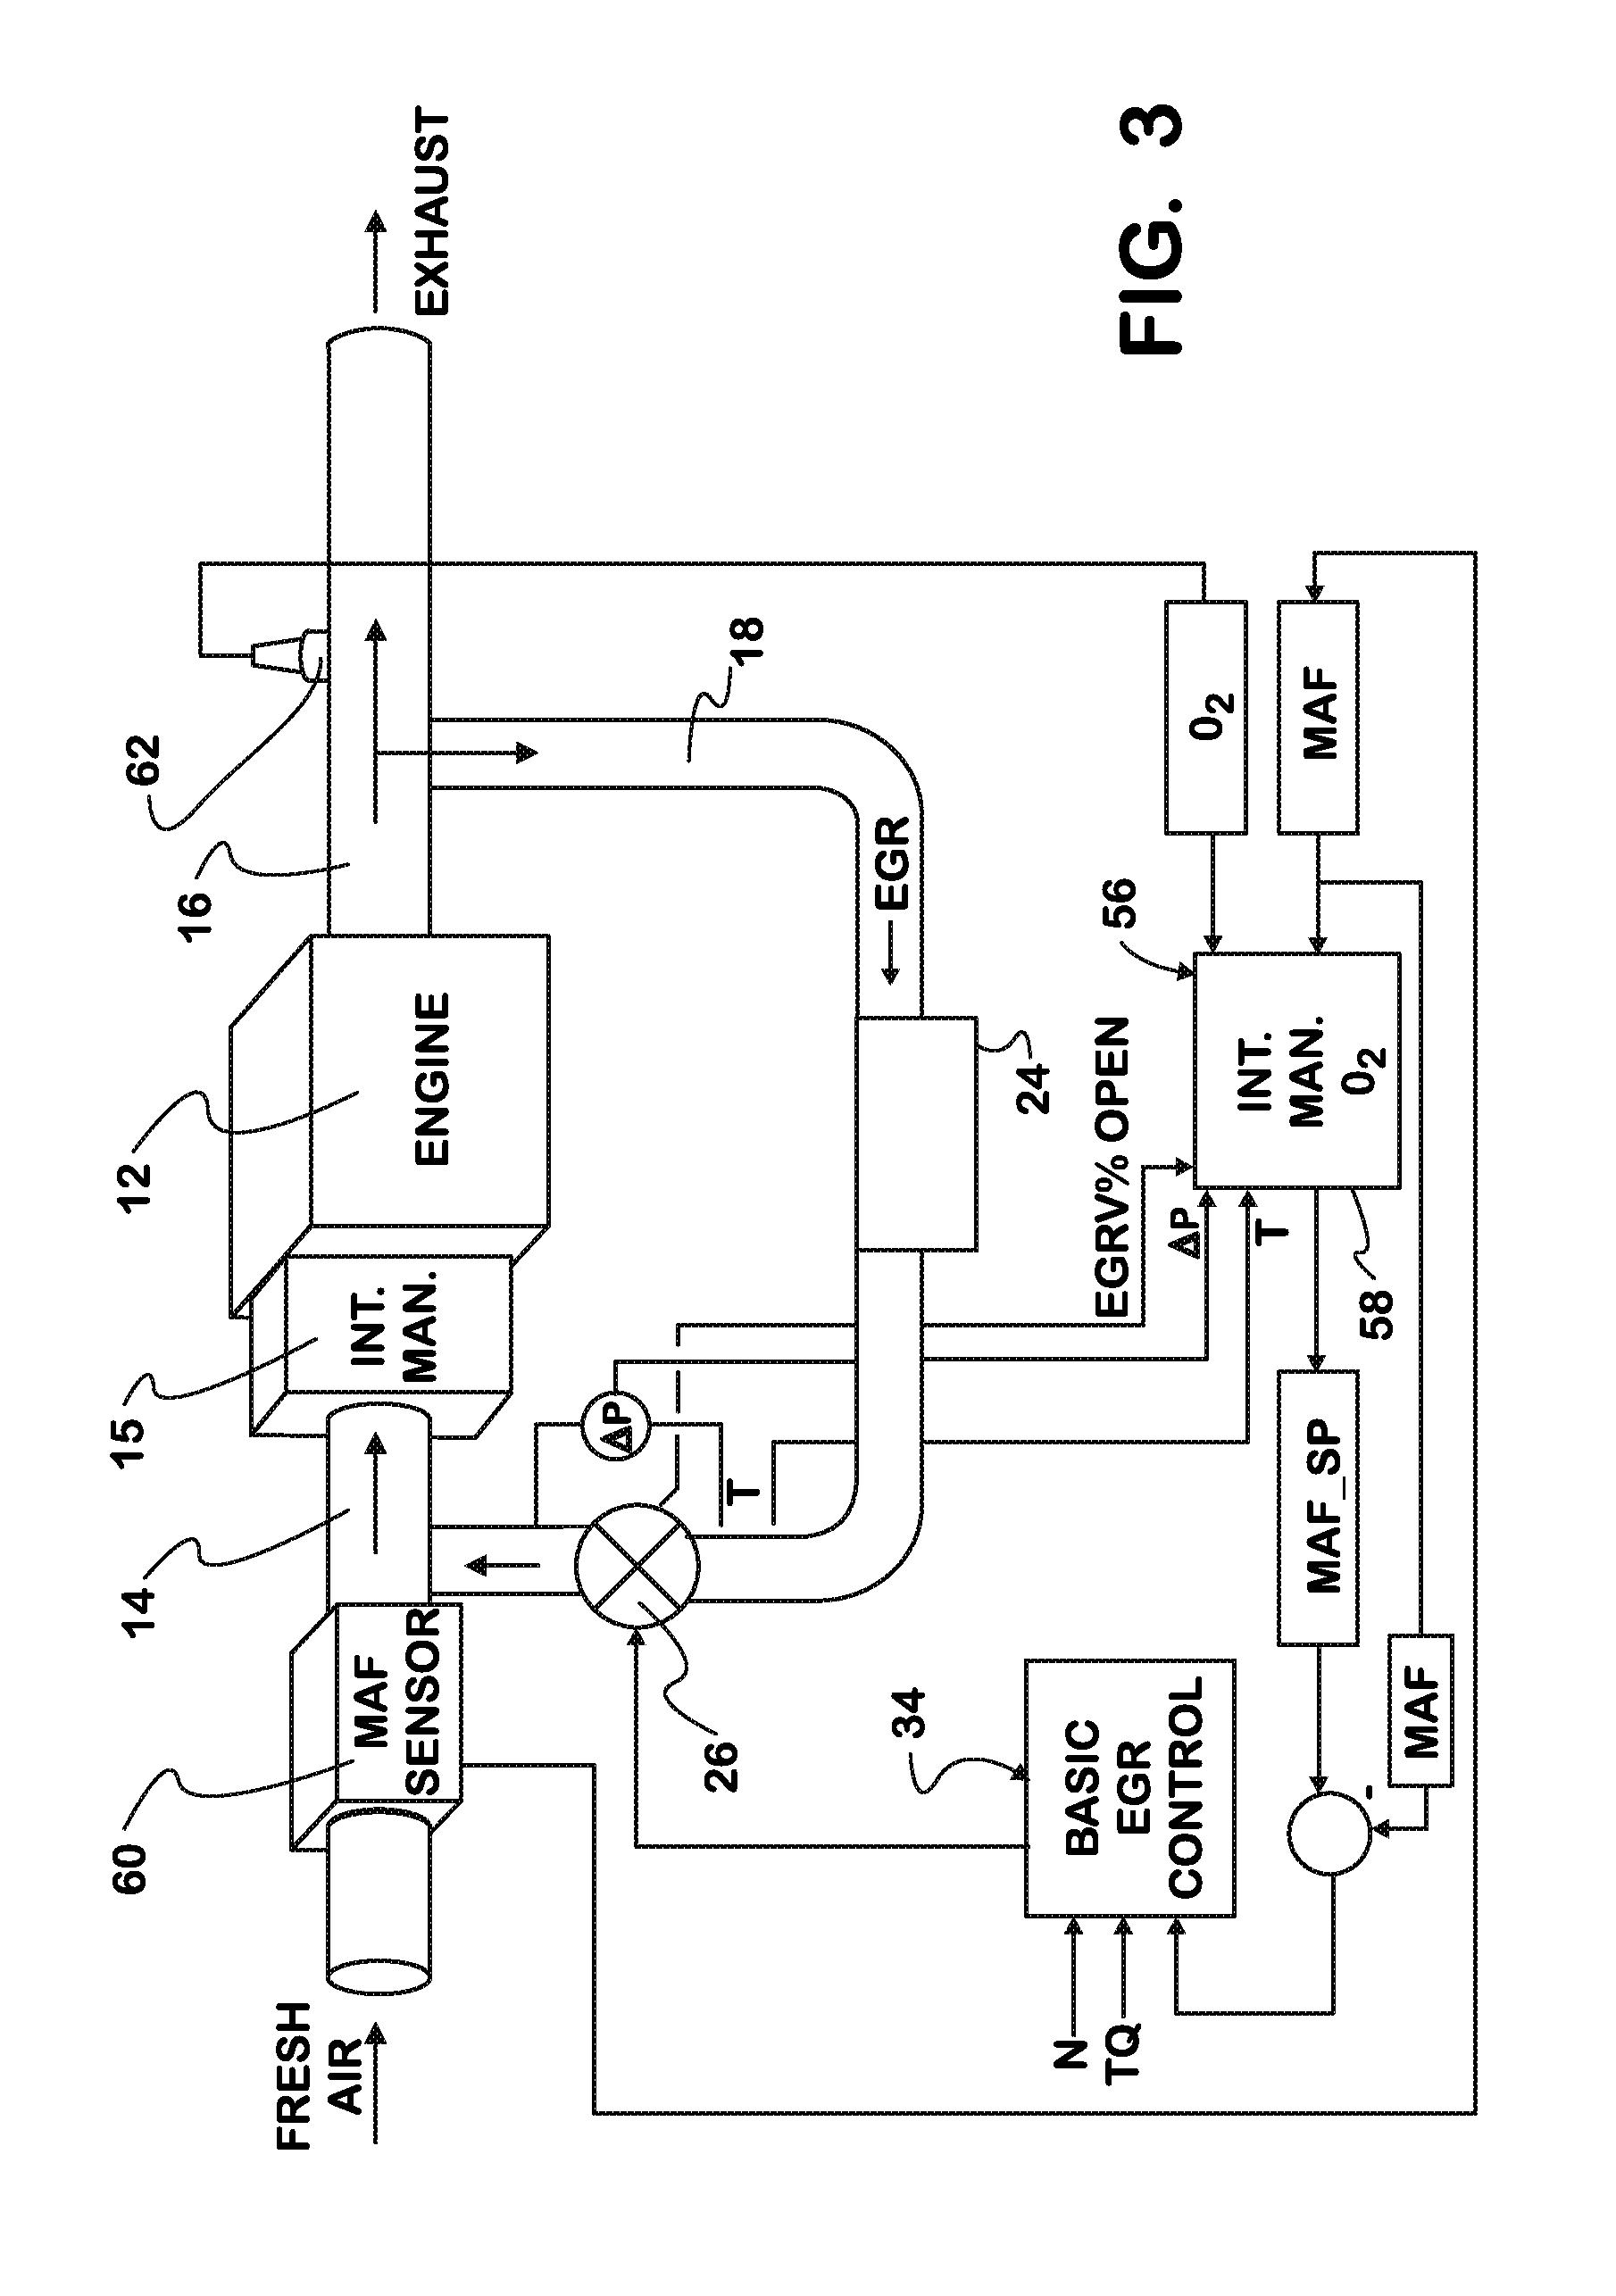 patent us8010276 - intake manifold oxygen control